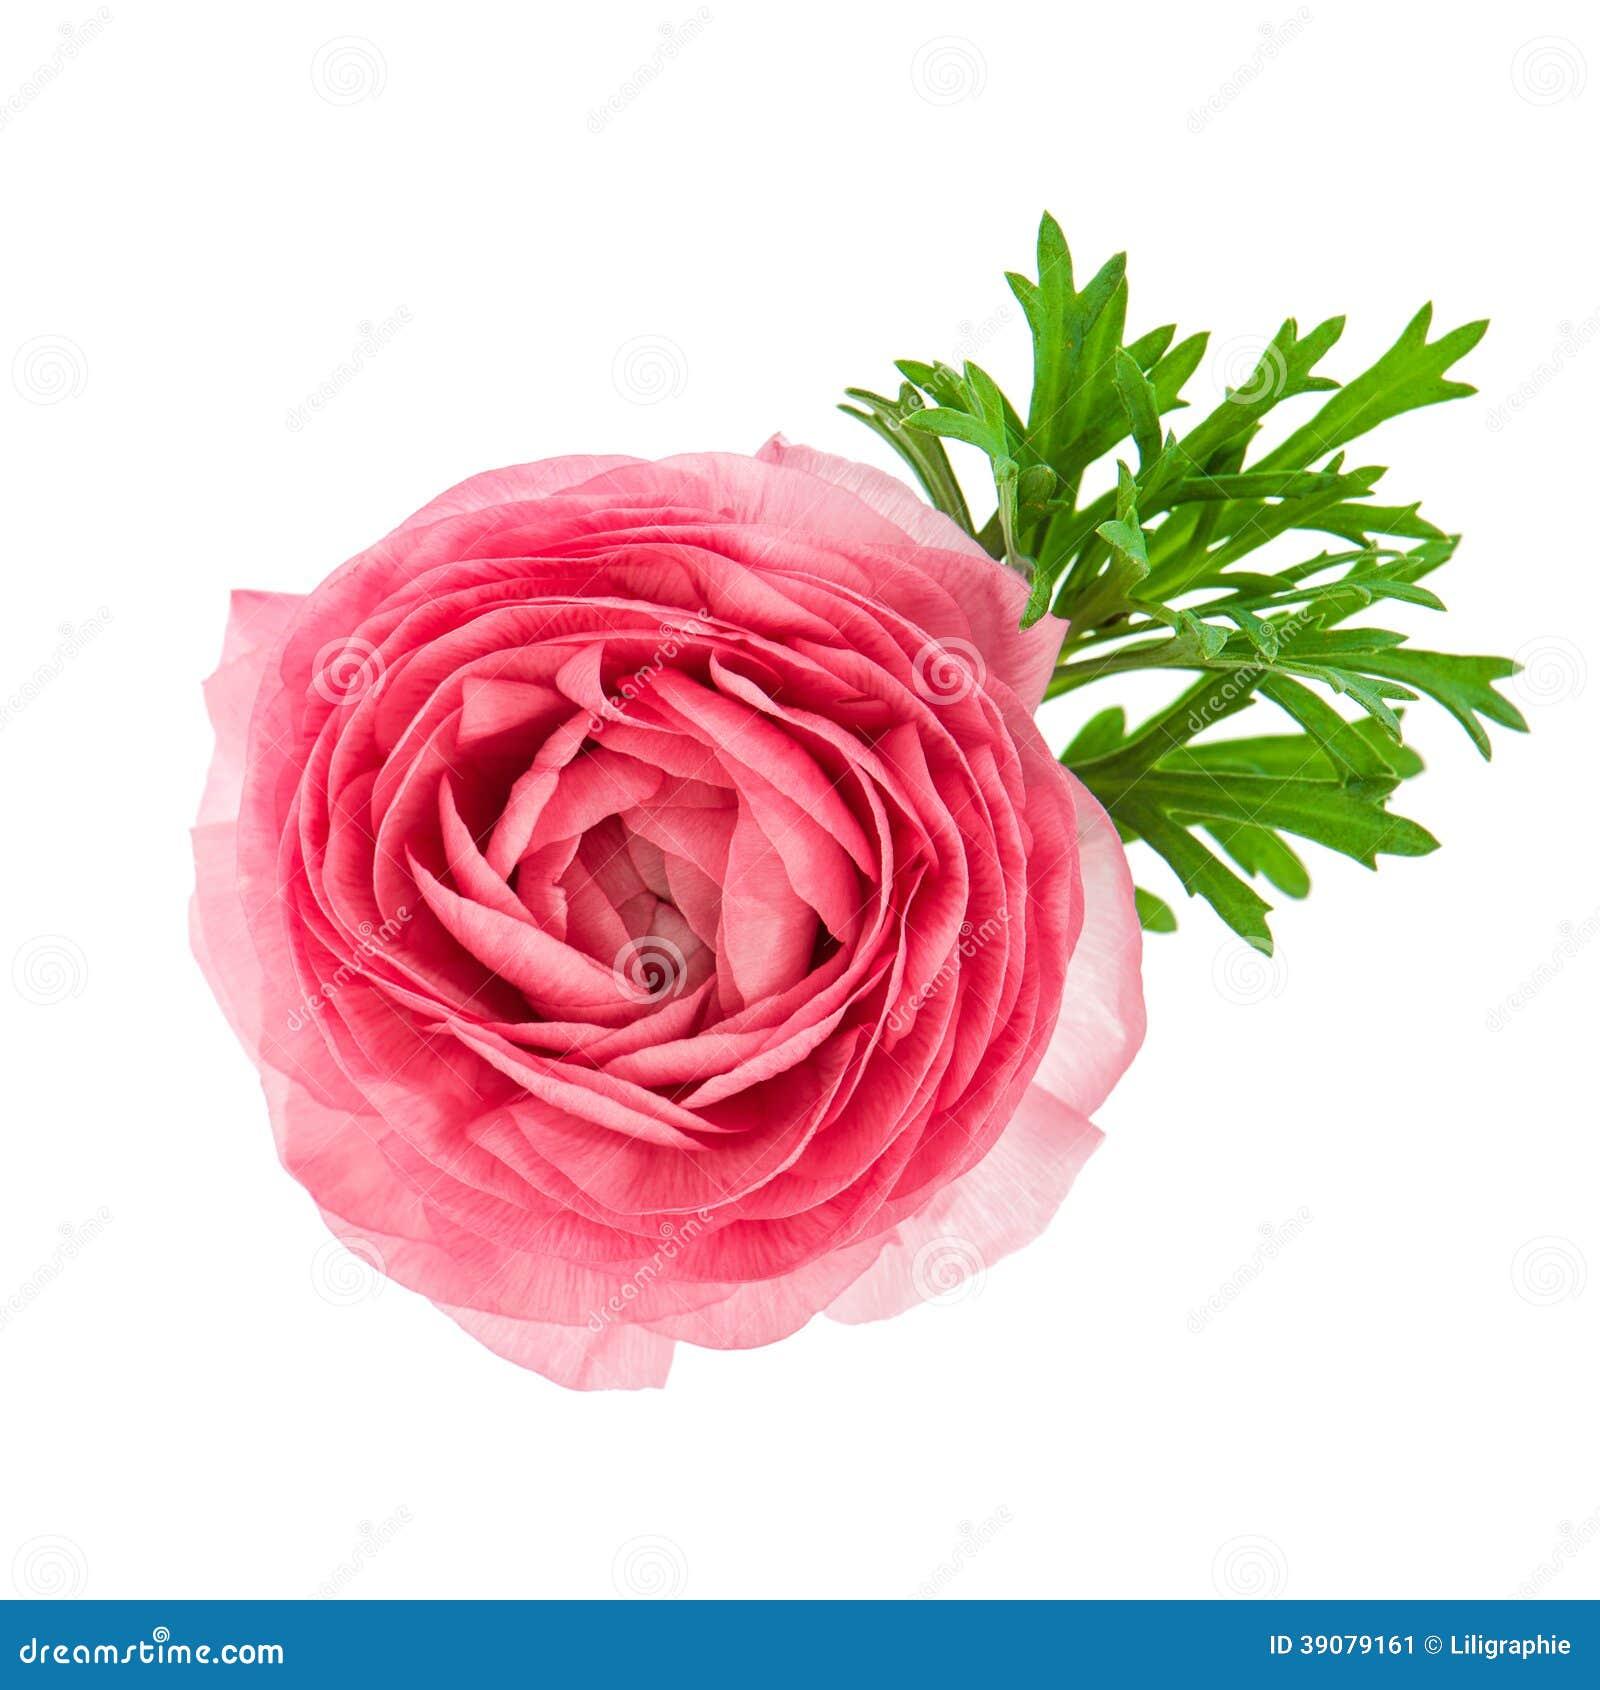 Beautiful single flower head of pink ranunculus stock image image download beautiful single flower head of pink ranunculus stock image image of detail decorative izmirmasajfo